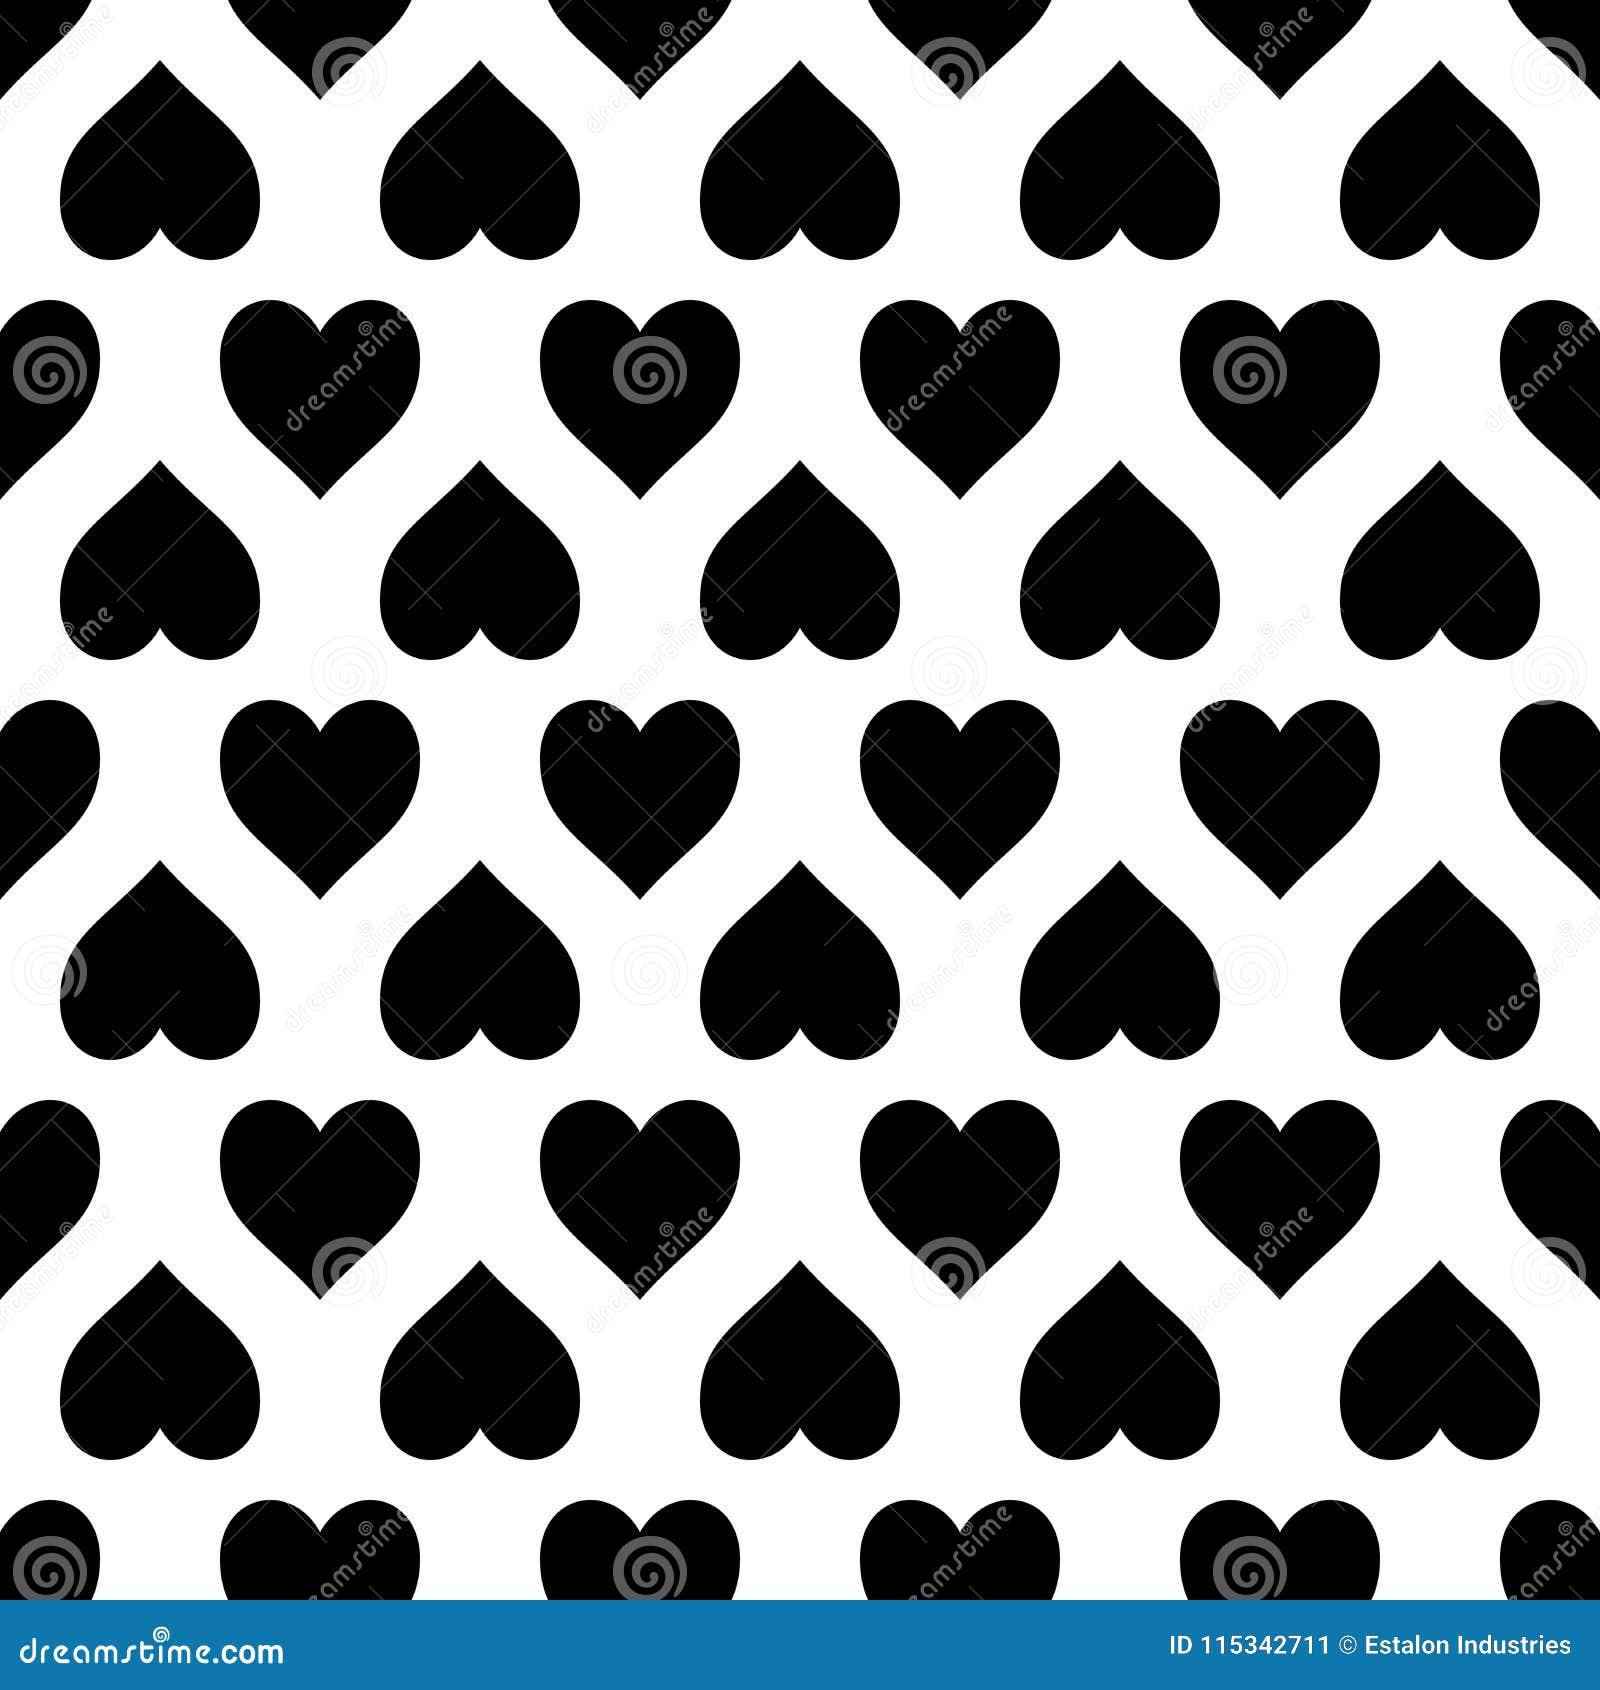 black white love heart pattern seamless repeat background two colour love heart pattern seamless repeat background could be 115342711